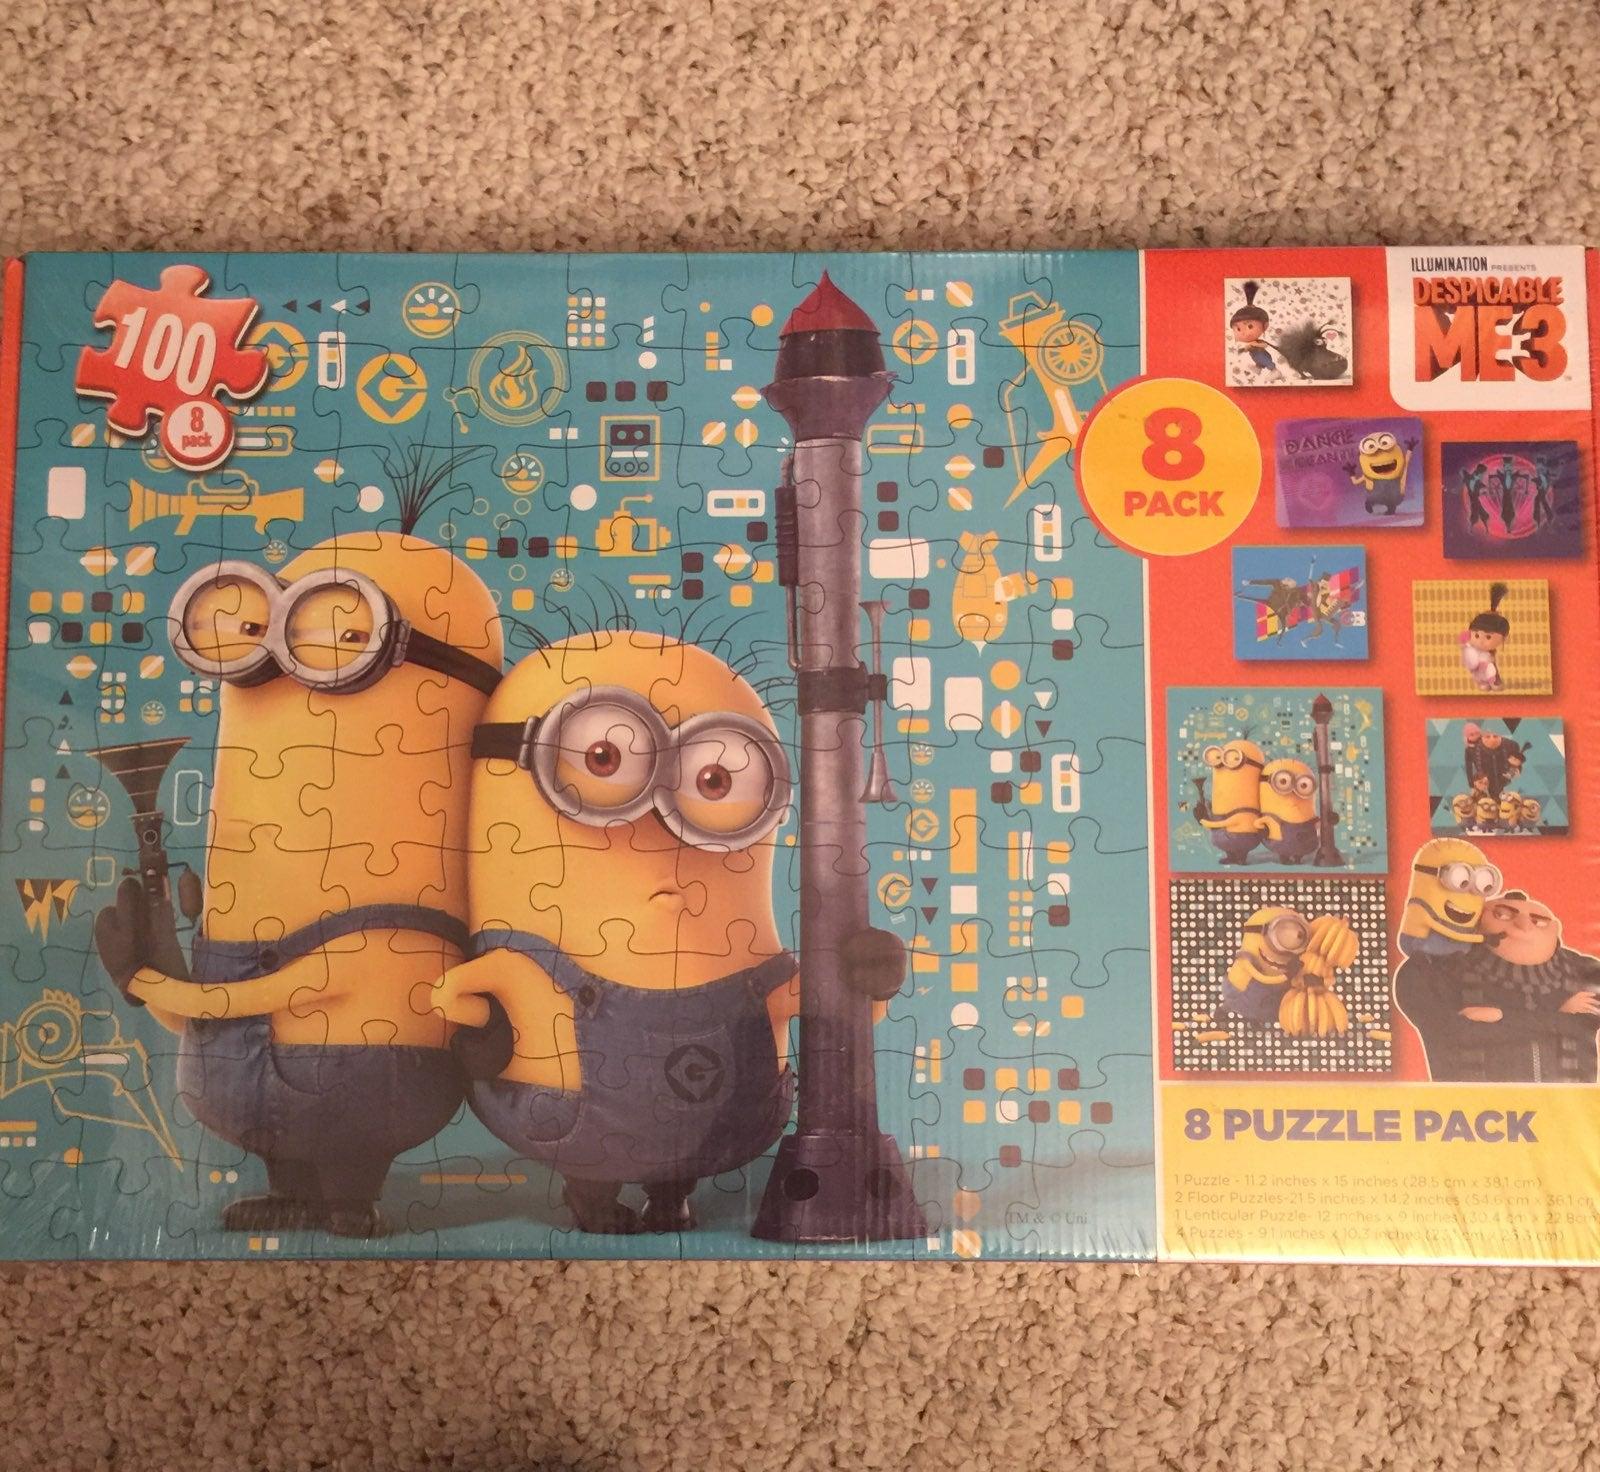 Despicable Me 3 Puzzle 8 Pack